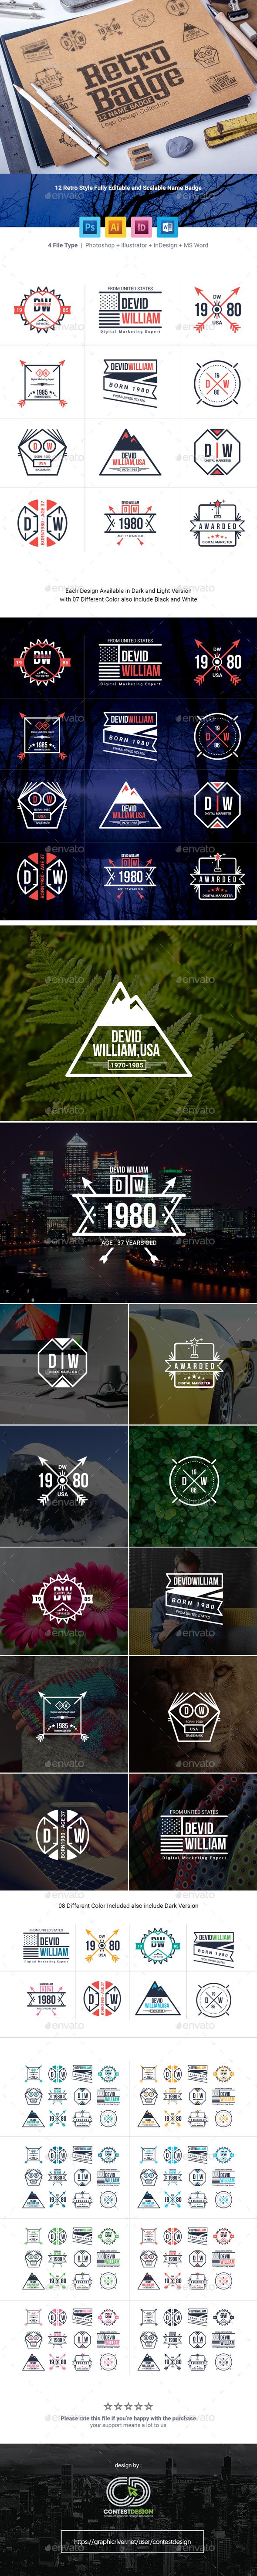 Retro Badge | Name Badge & Logo Collection - Badges & Stickers Web Elements